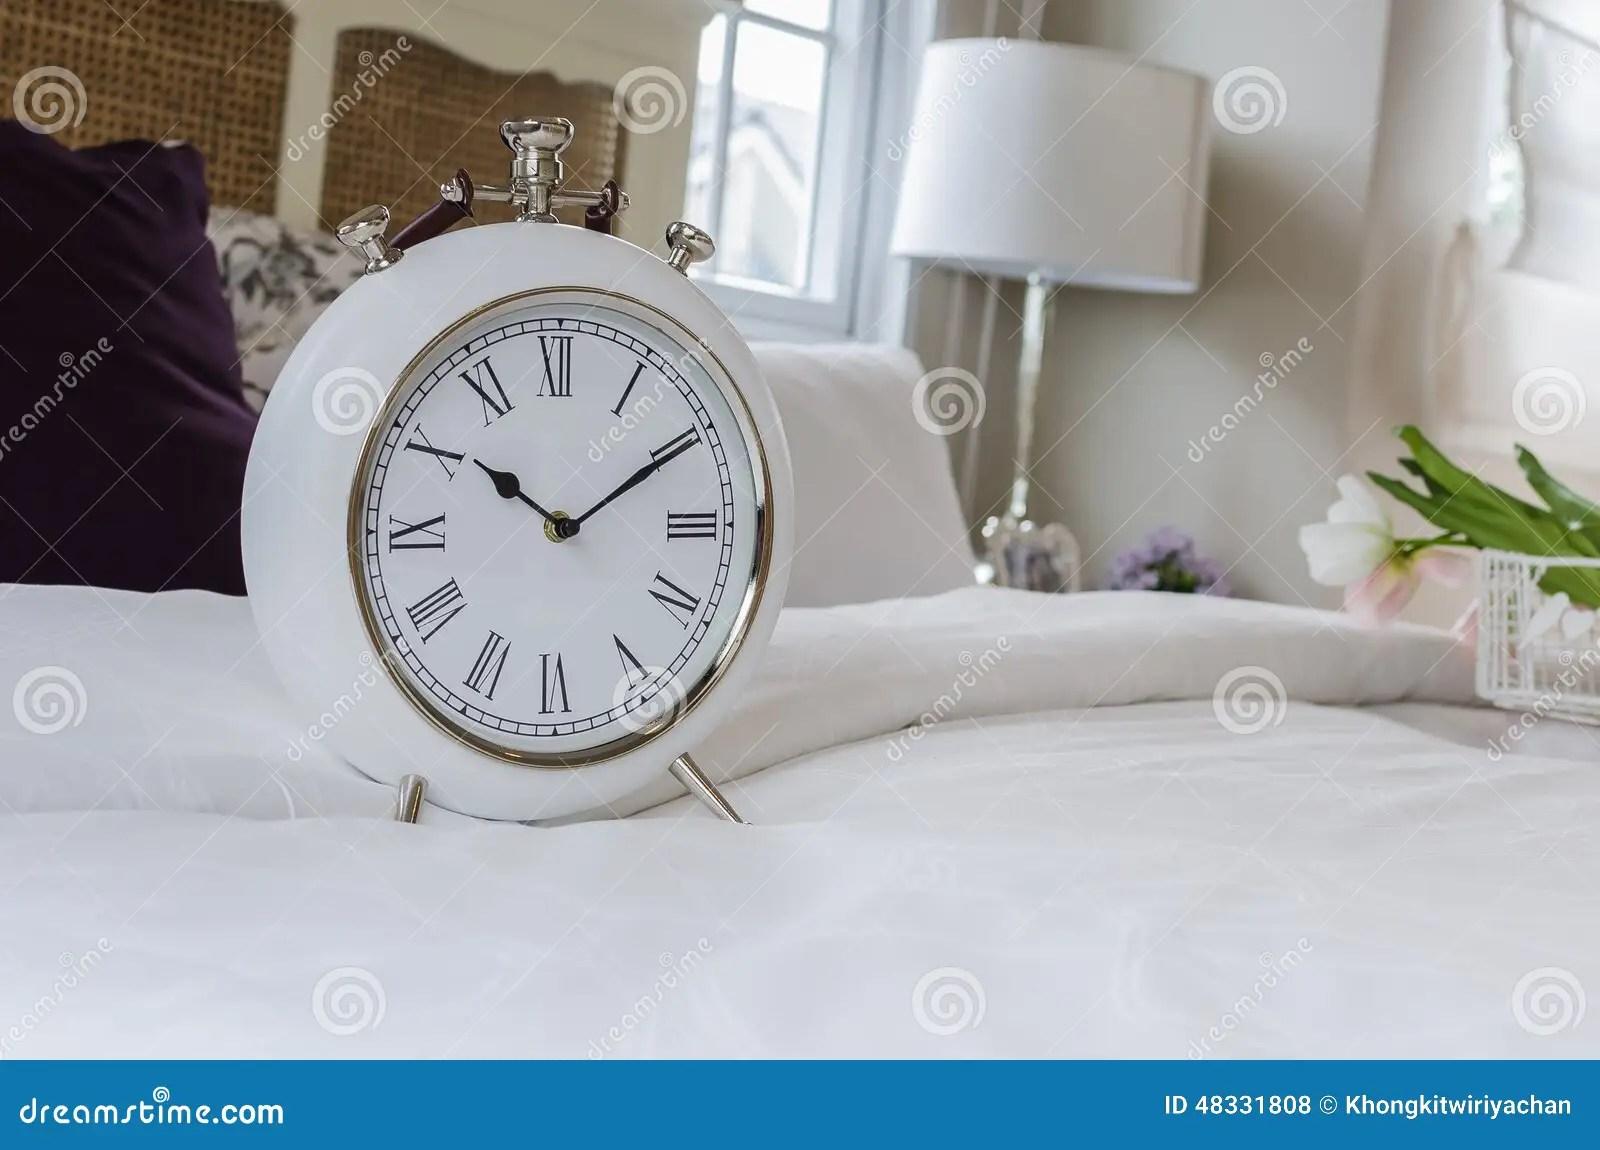 Alarm-clock In Morning Bedroom Royalty-Free Stock Photo